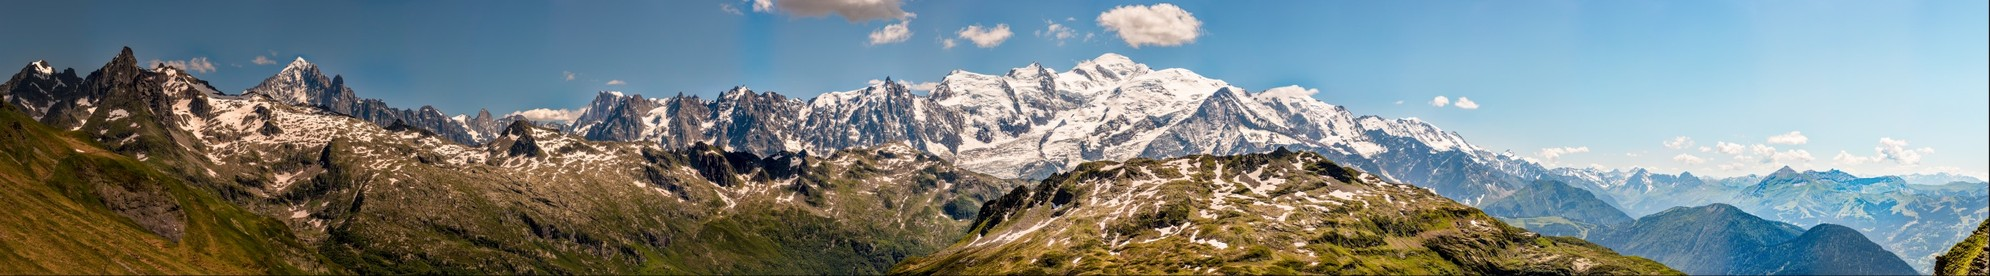 Col d'Anterne - Massif du Mont Blanc